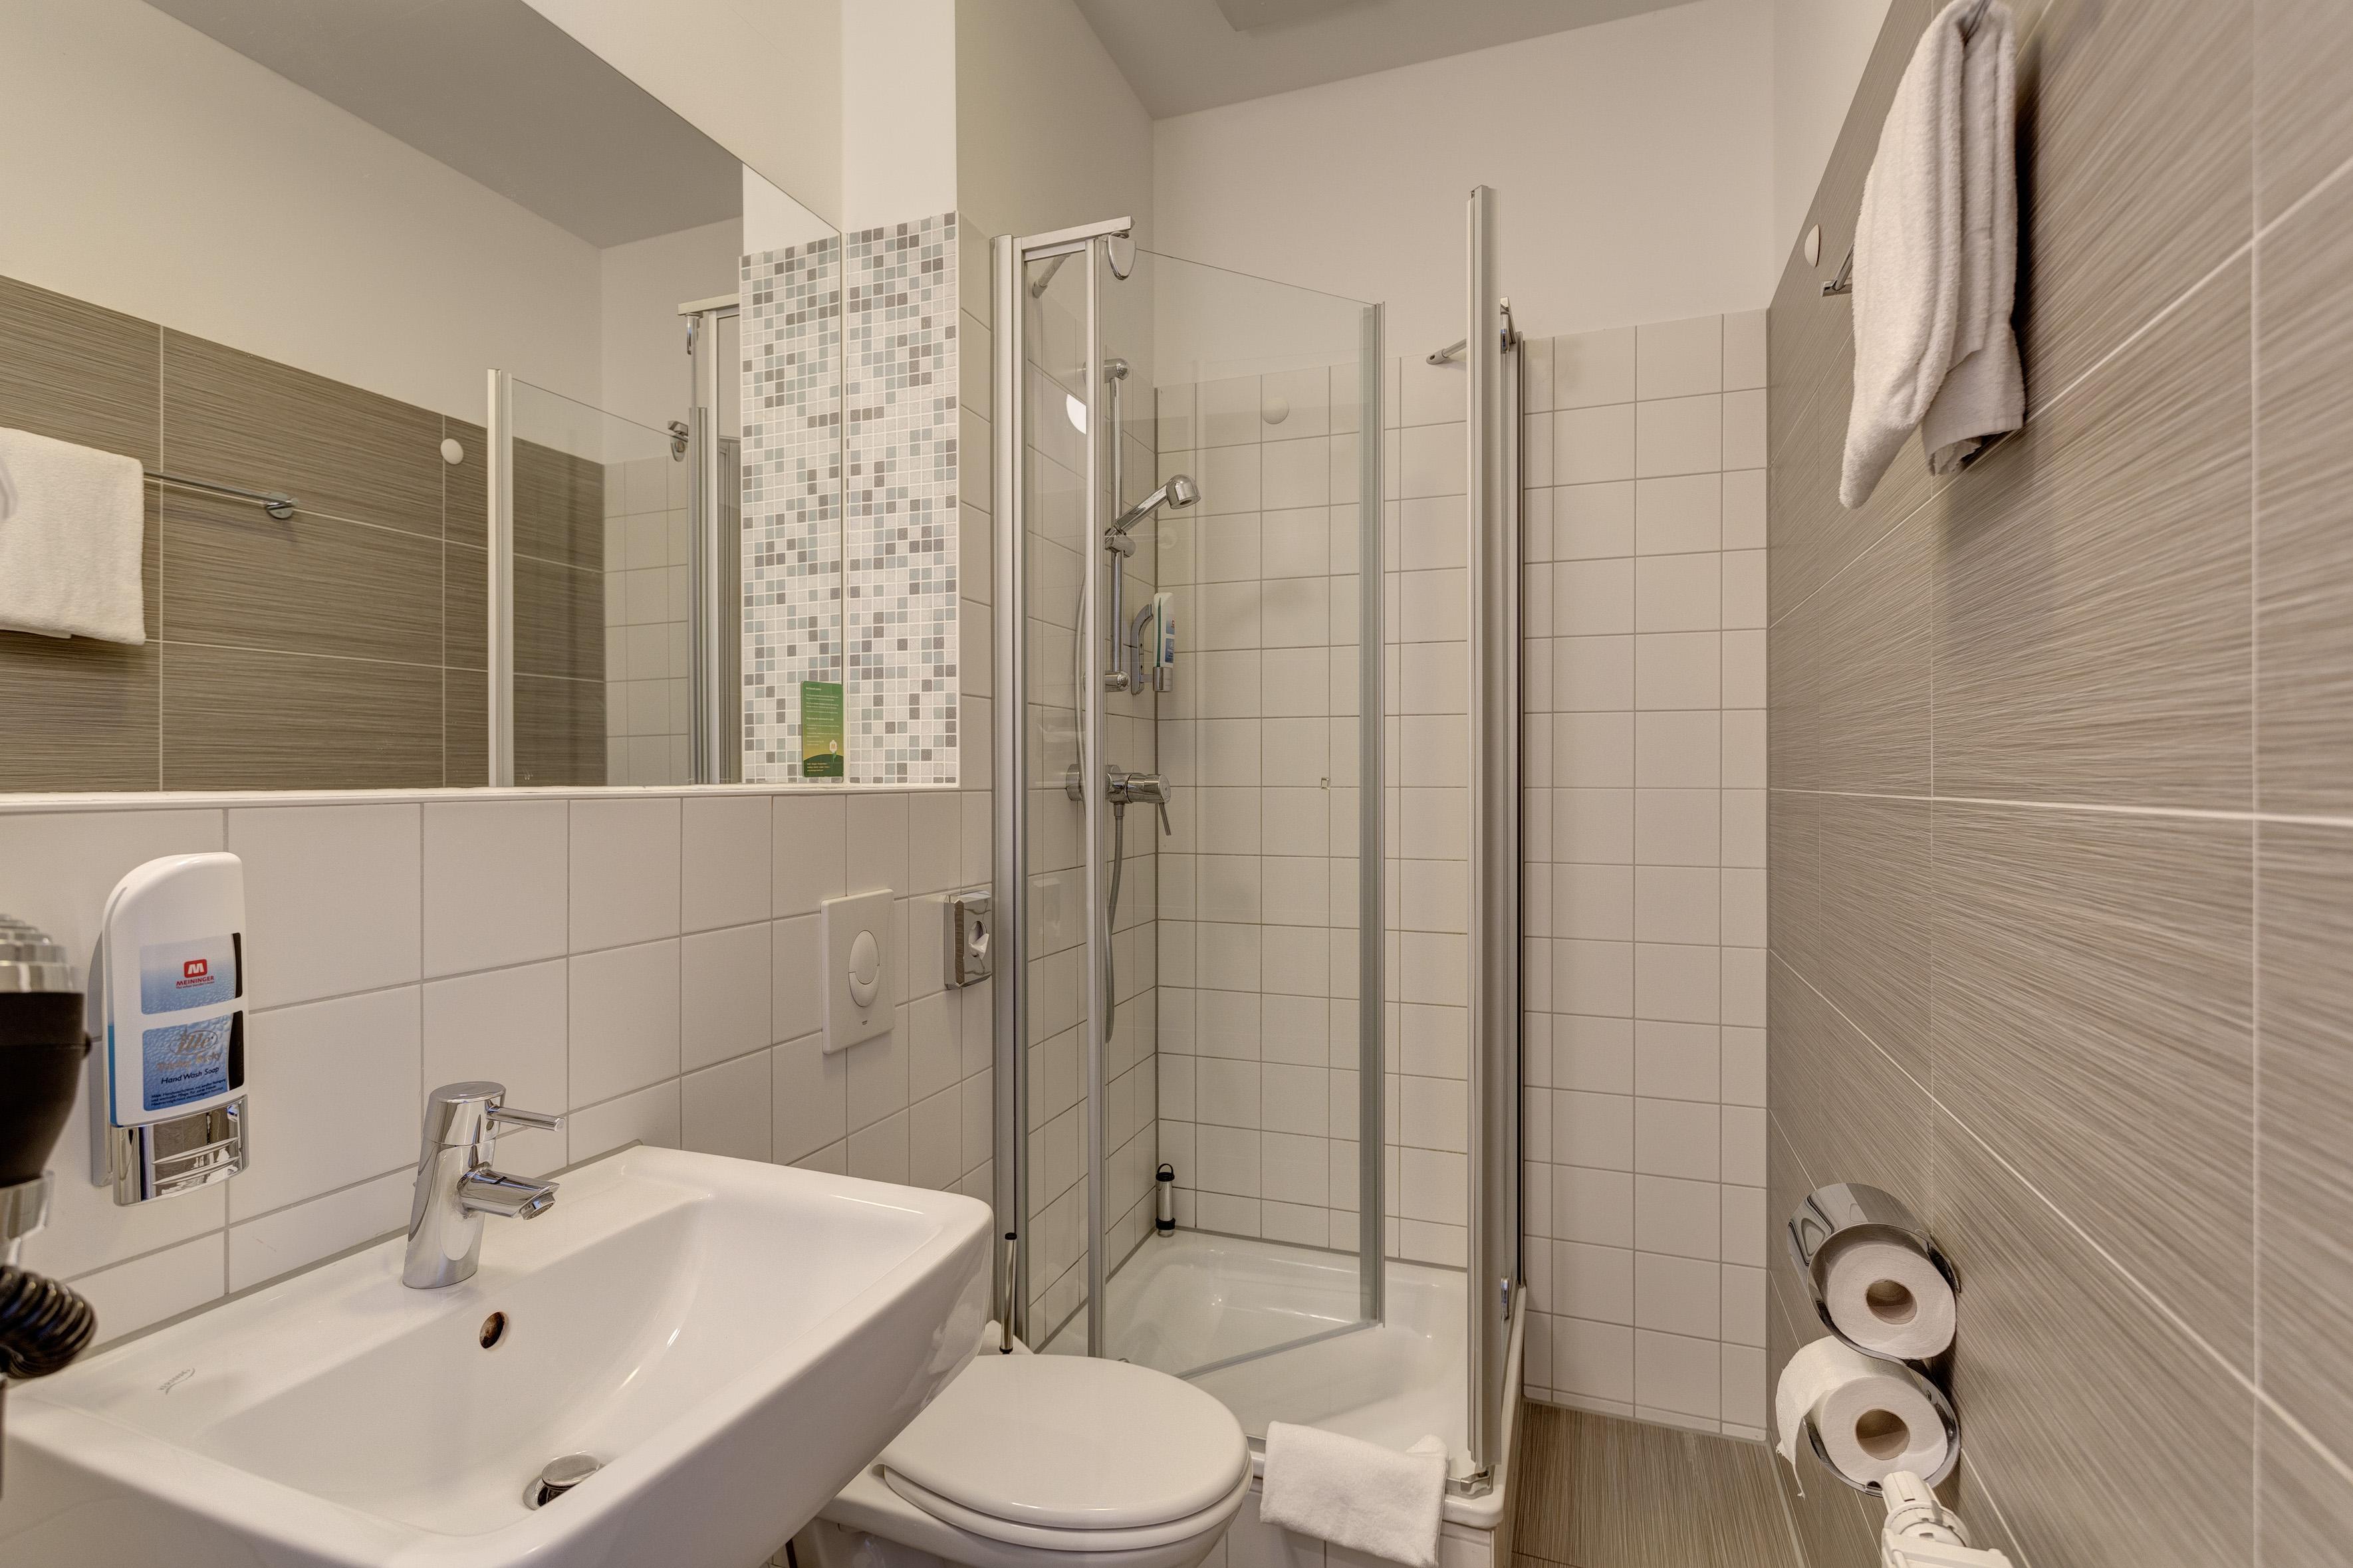 MEININGER Hotel Hamburg City Center - habitacion familiar